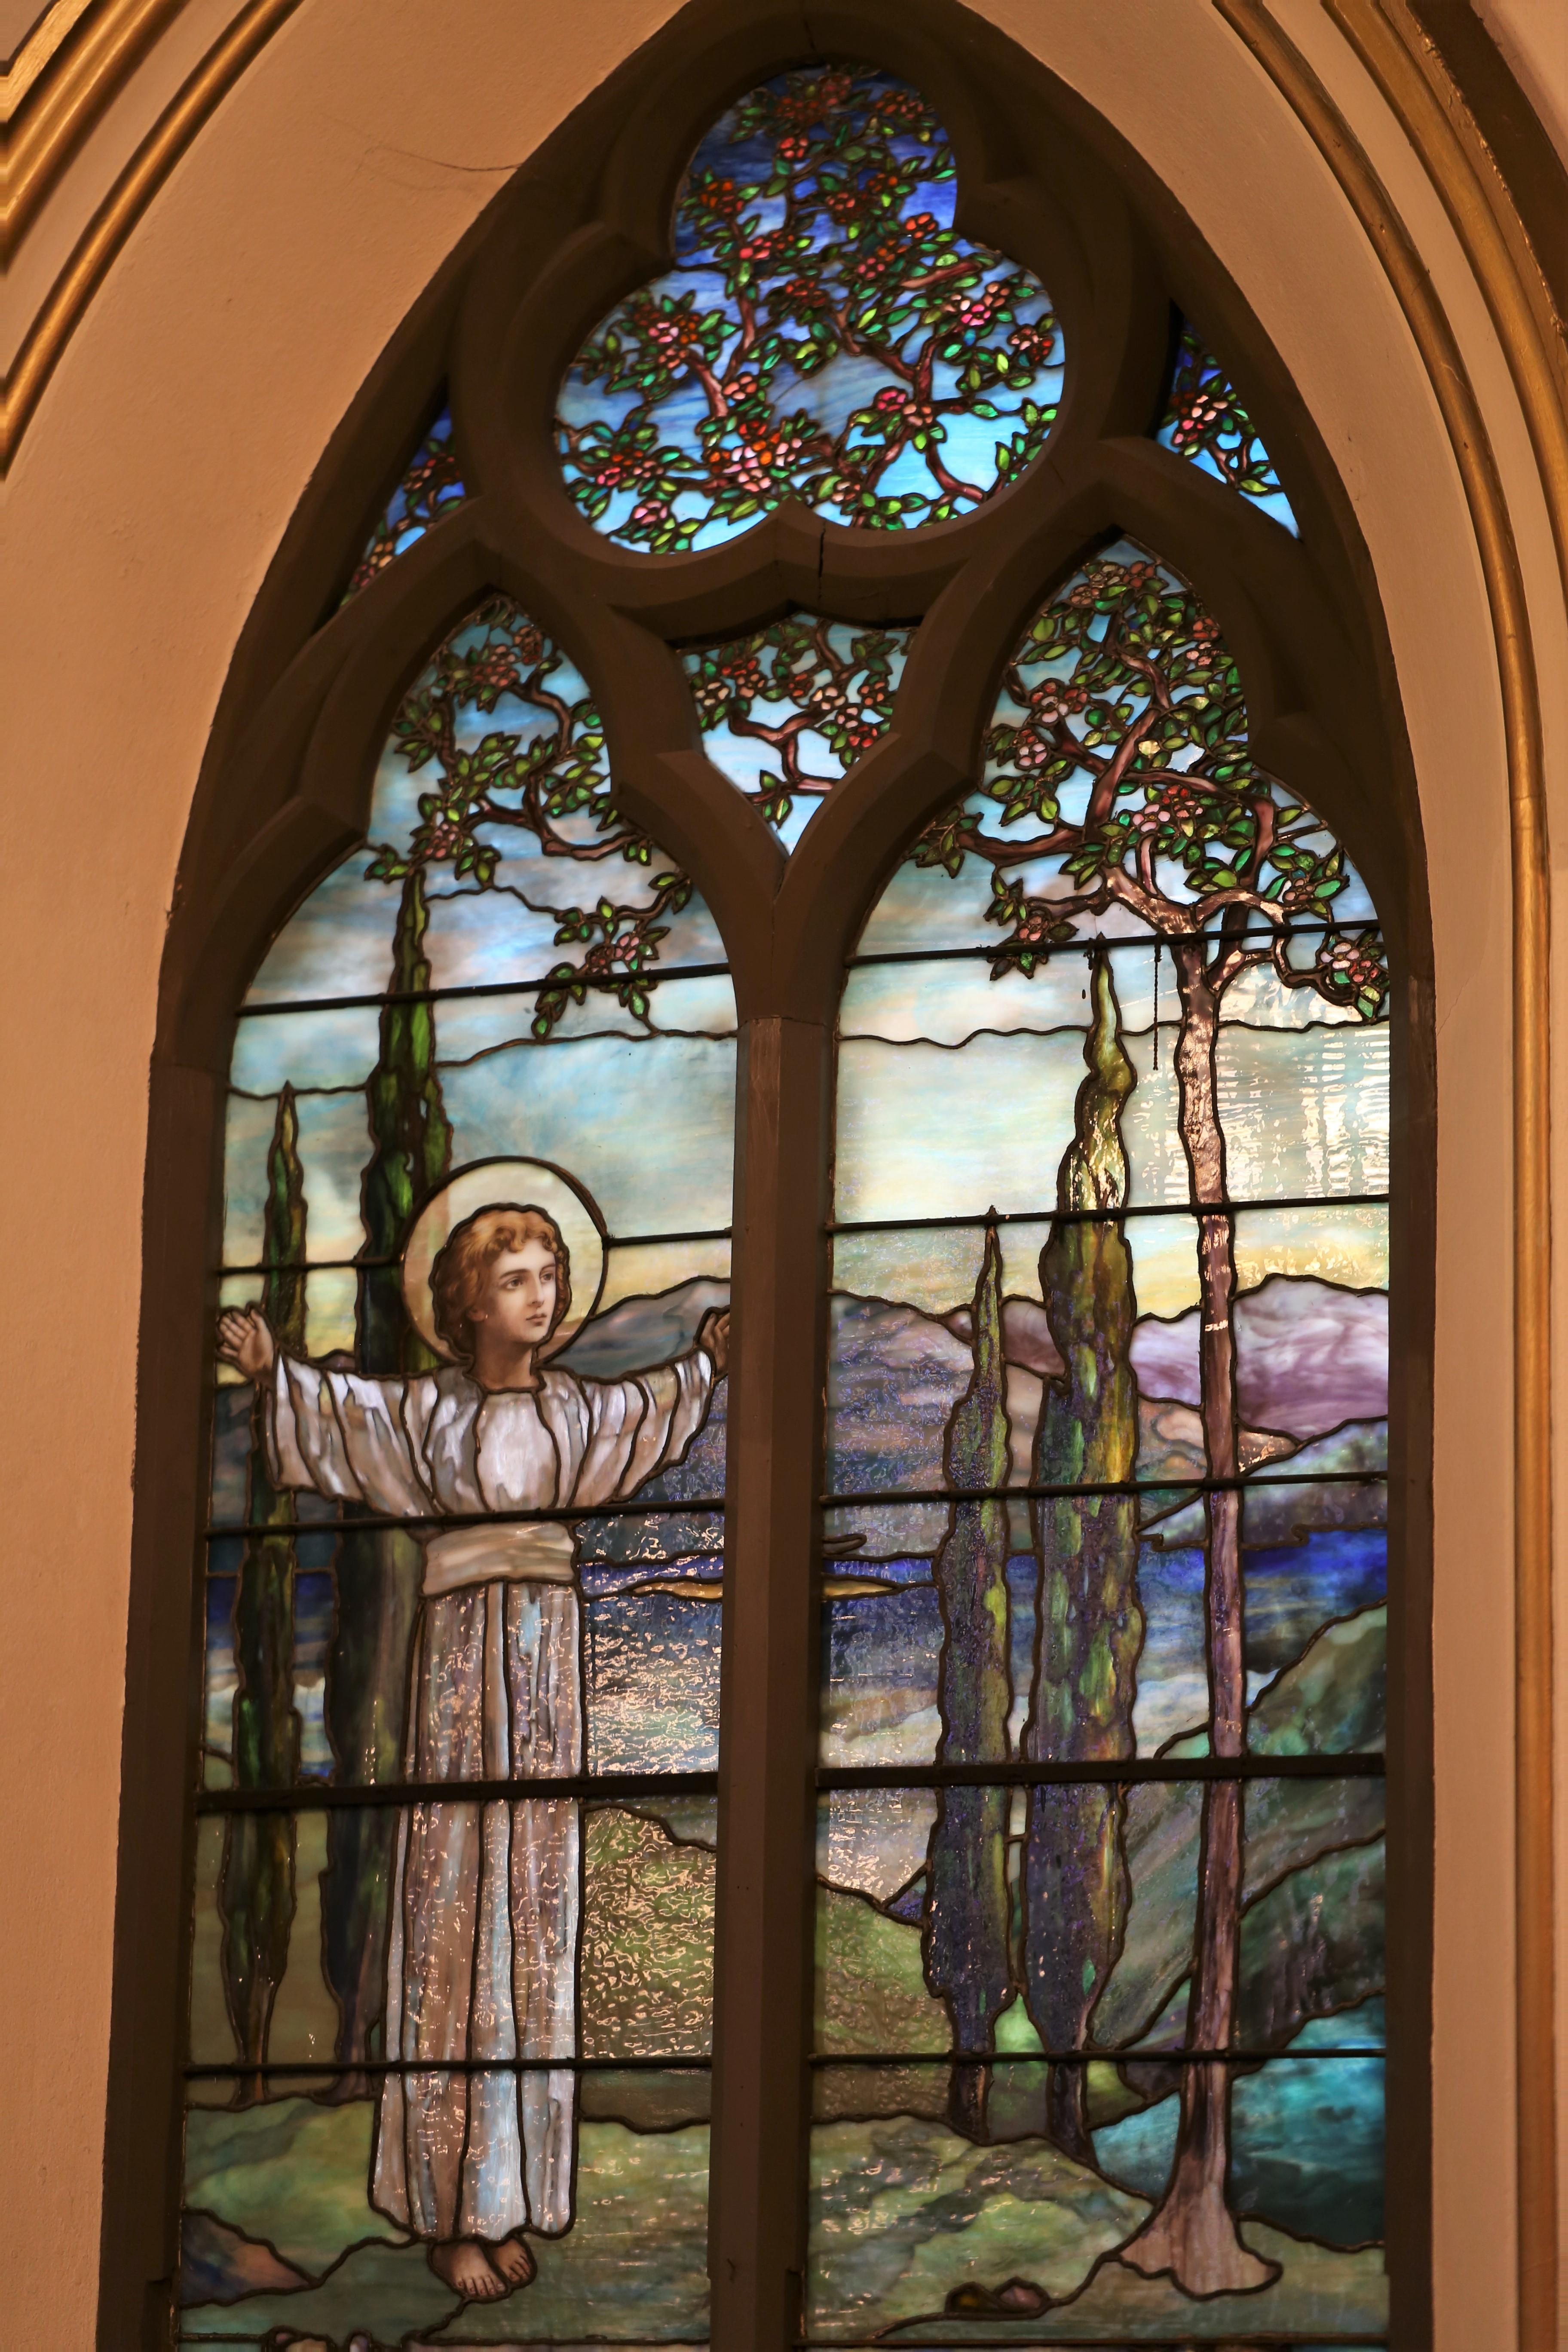 St. Marks Episcopal Church Tiffany window